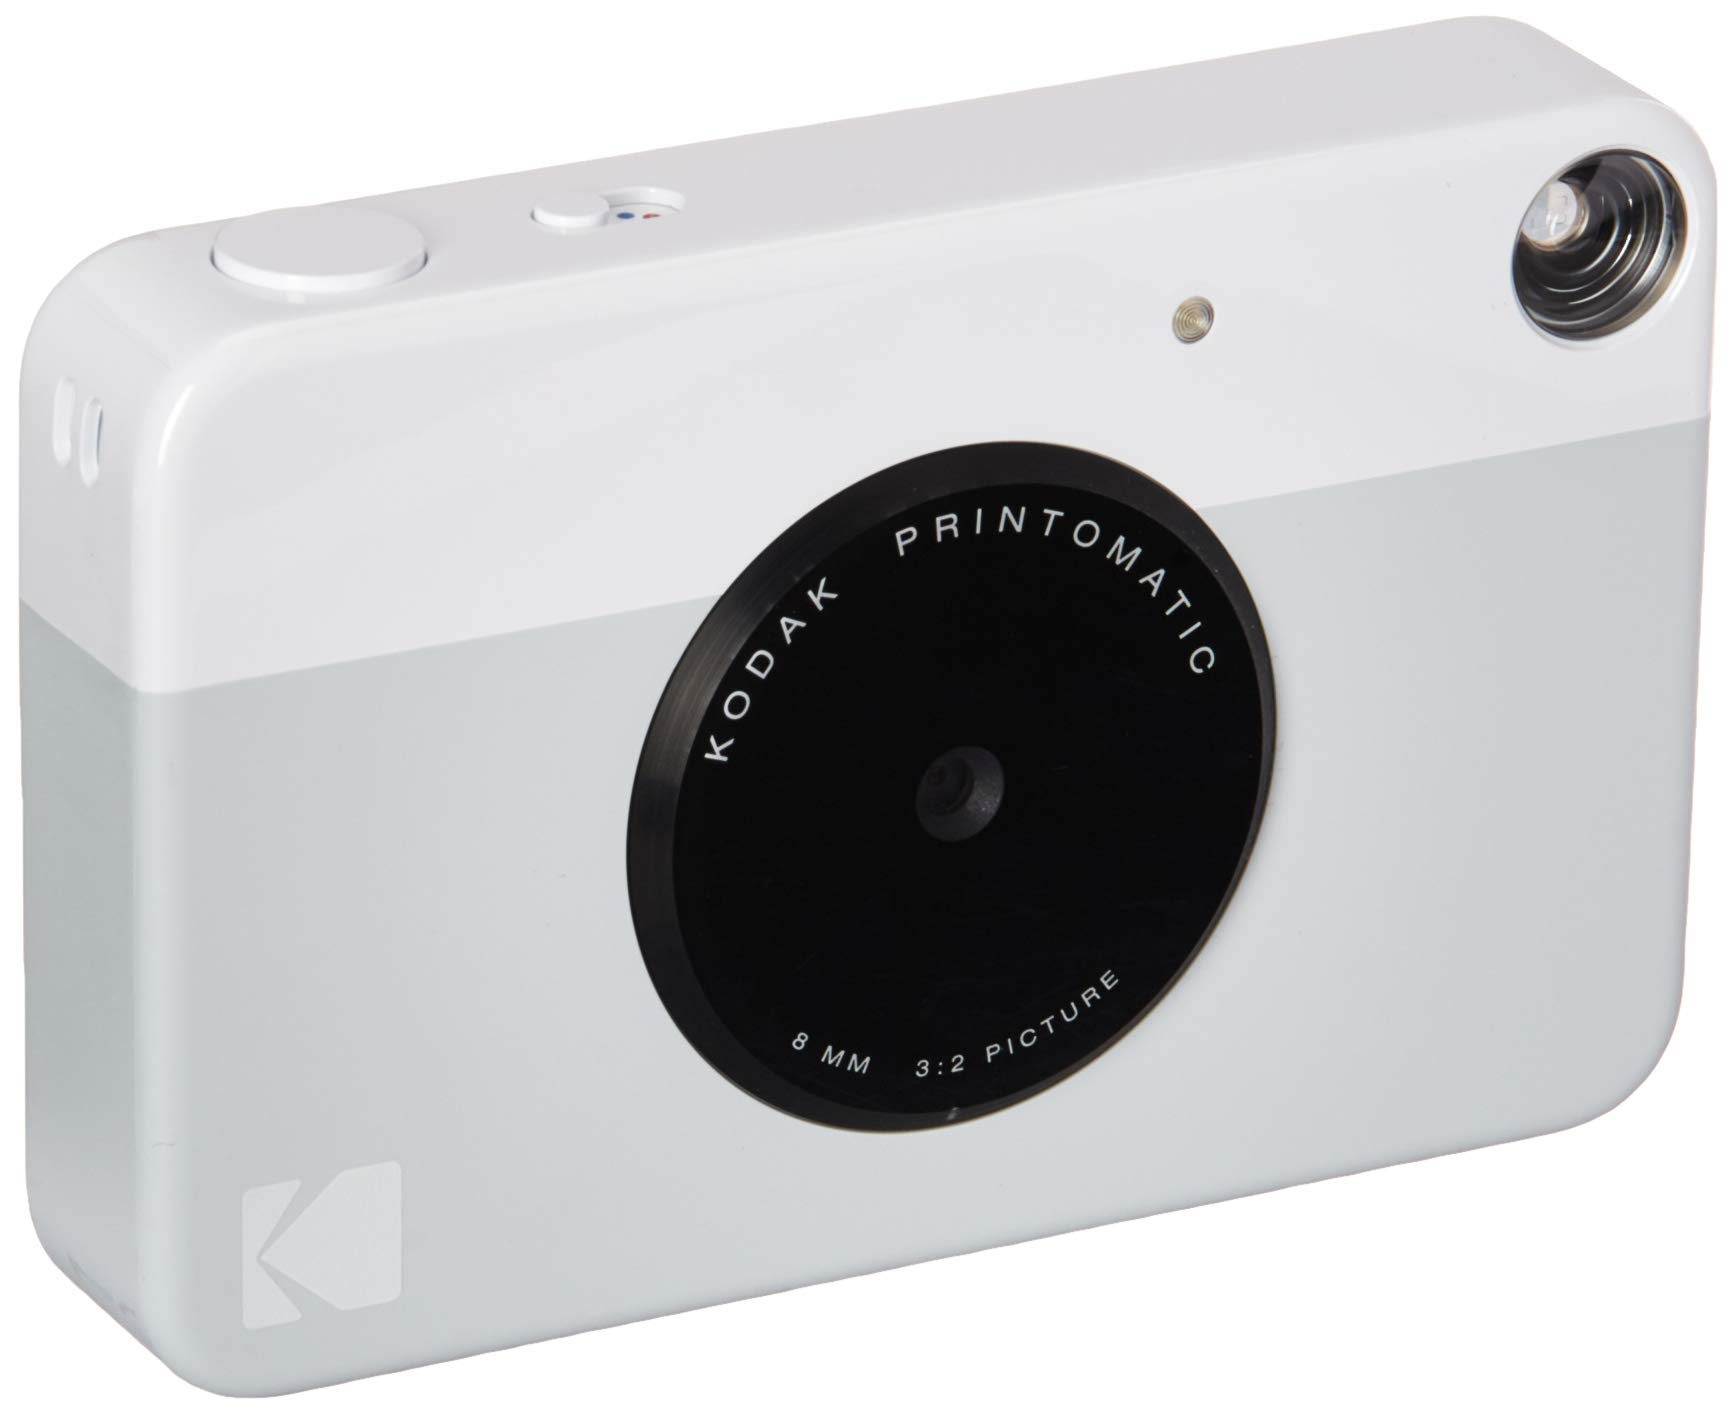 Kodak PRINTOMATIC Digital Instant Print Camera (Grey), Full Color Prints On ZINK 2x3'' Sticky-Backed Photo Paper - Print Memories Instantly